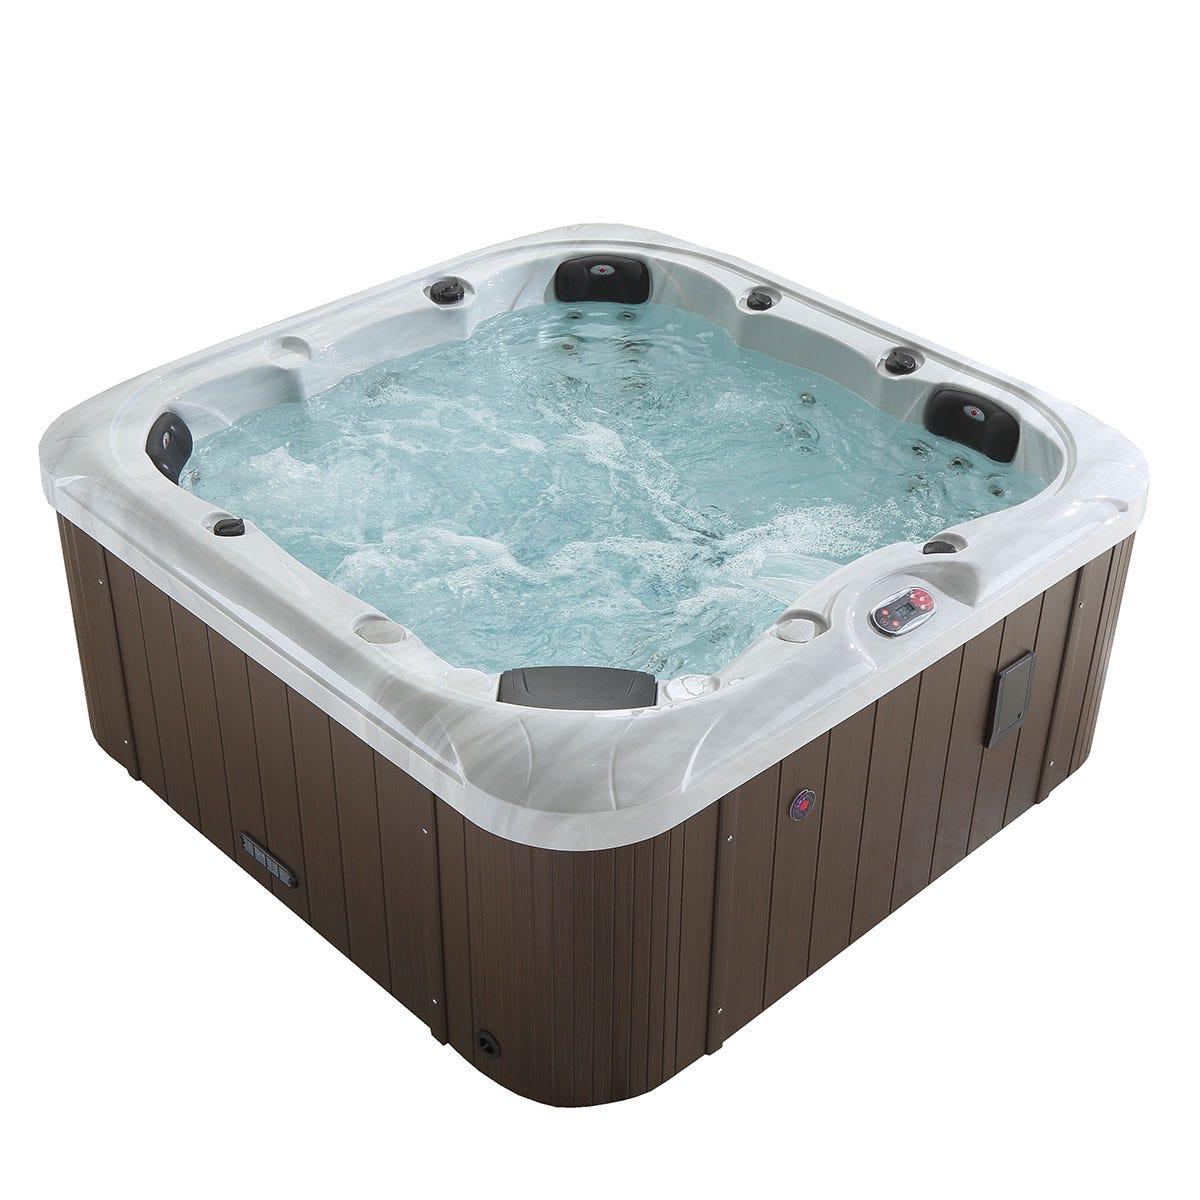 Canadian Spa Cambridge 33-Jet 5-6-Person Hot Tub